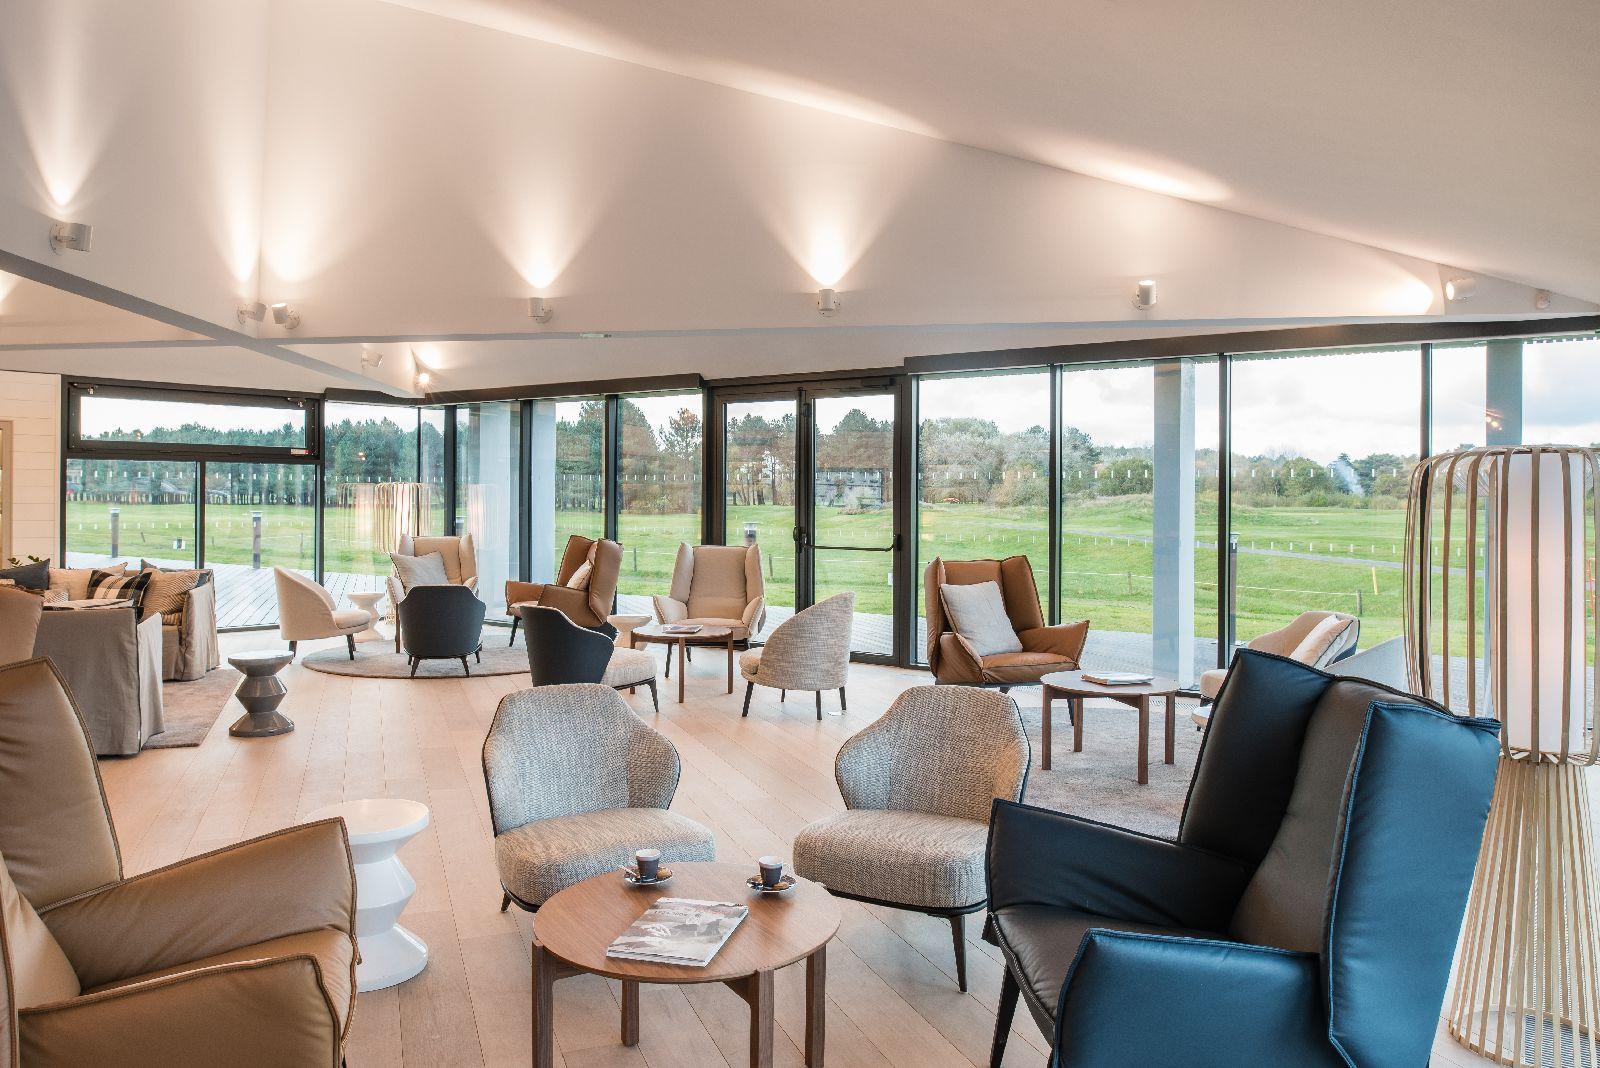 golf-expedition-golf-reizen-frankrijk-regio-pas-de-calais-le-manoir-hotel-clubhuis-lounge.jpg